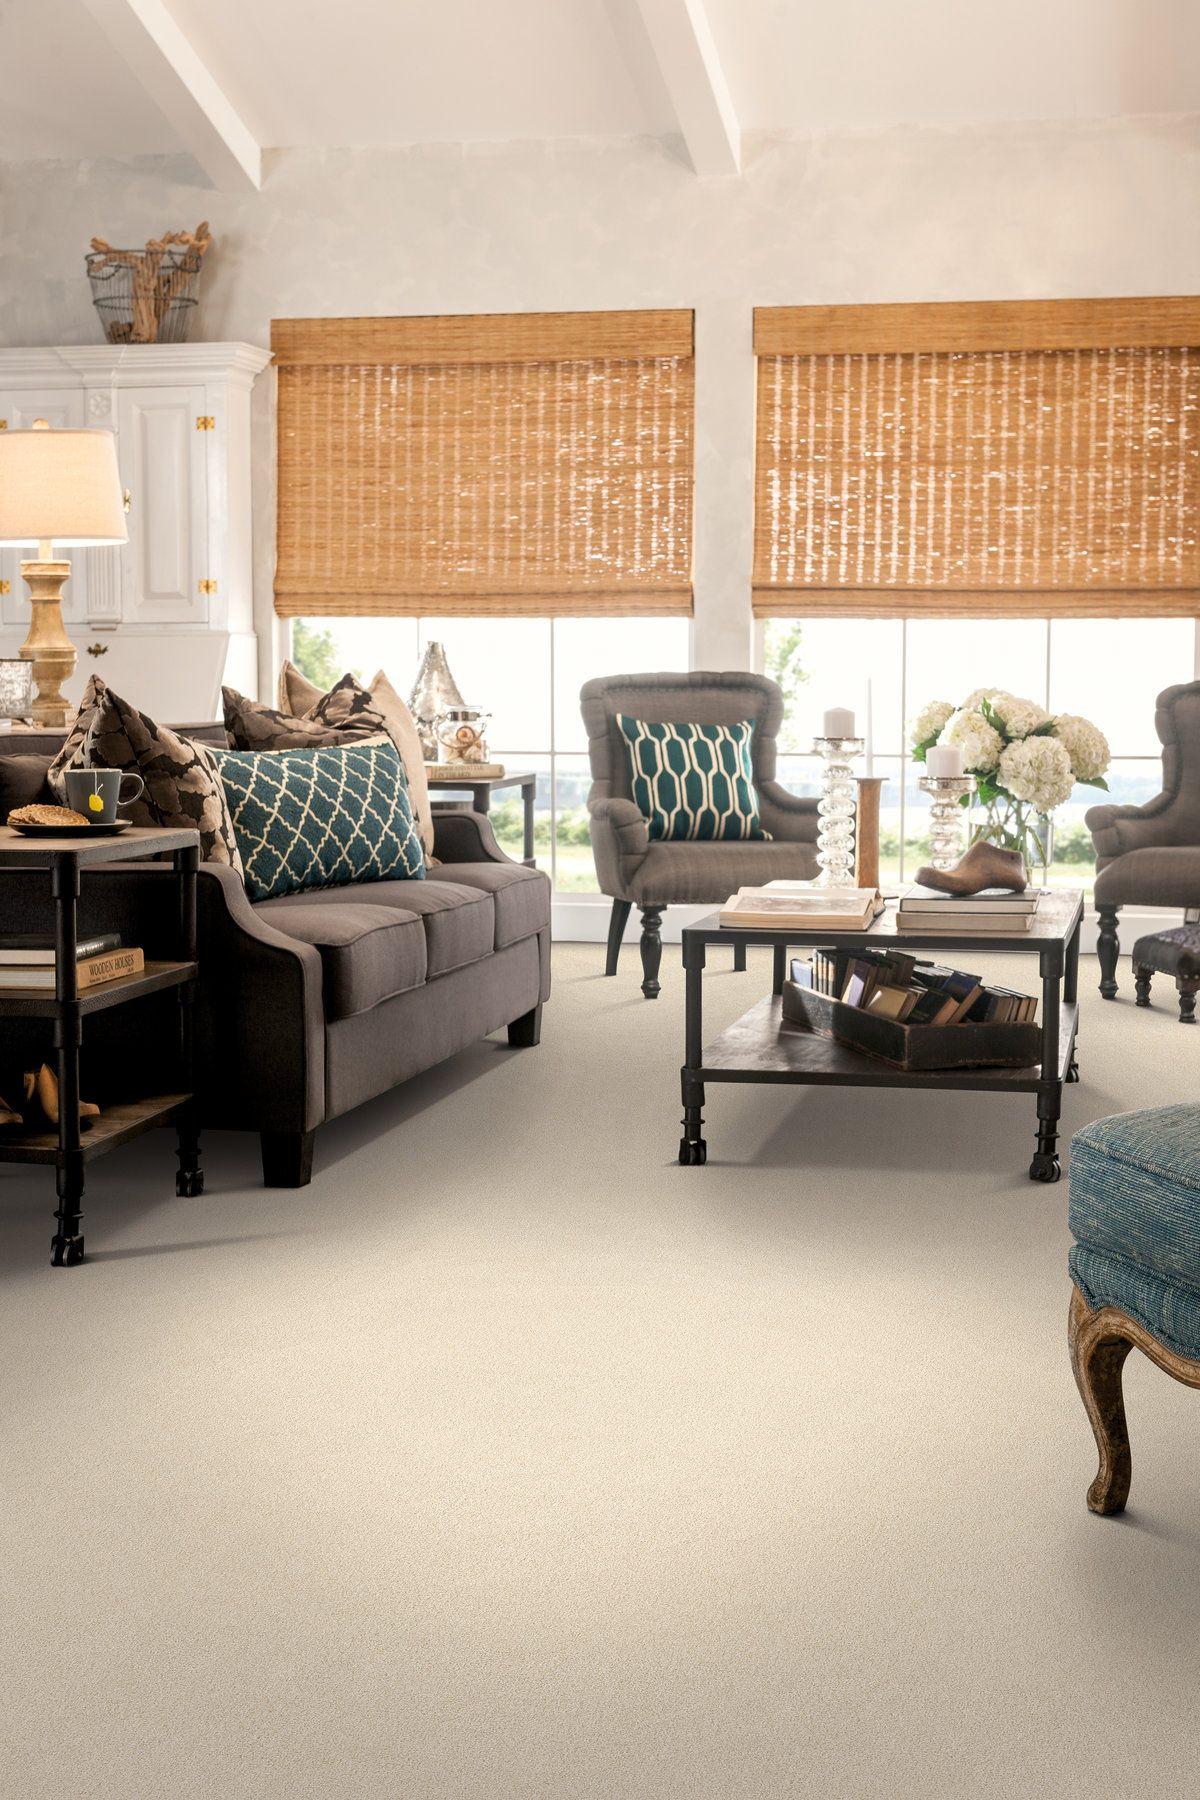 Carpet store at Improve Mall 7250 Keele Street, Unit 205